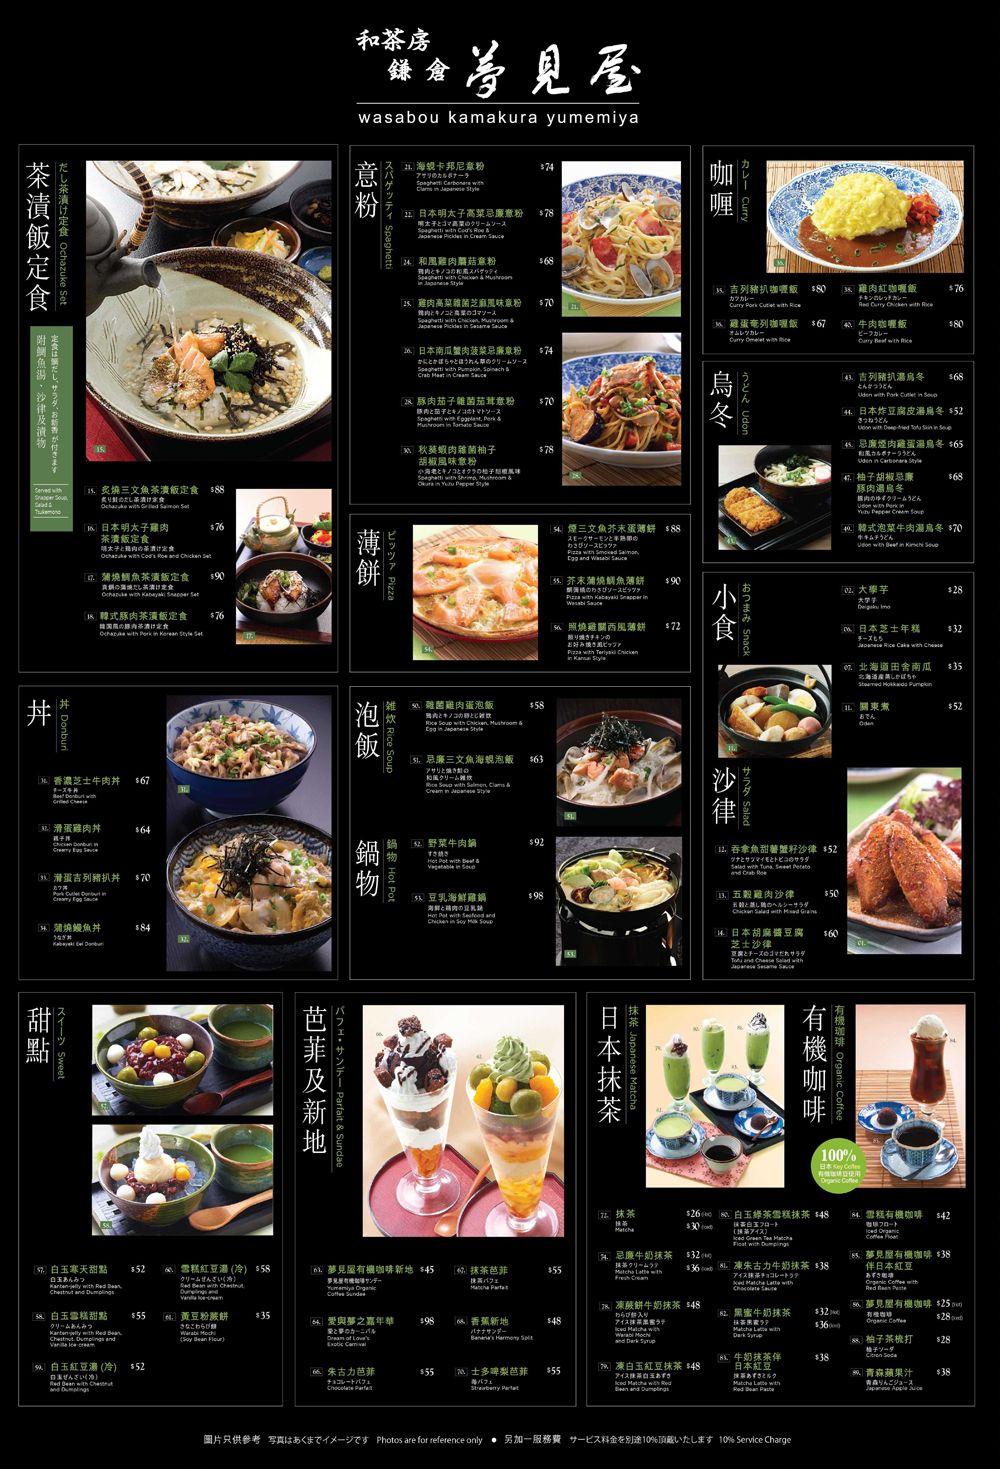 Yumemiyabanner Jpg 1000 1469 Menu Design Menu Restaurant Food Design